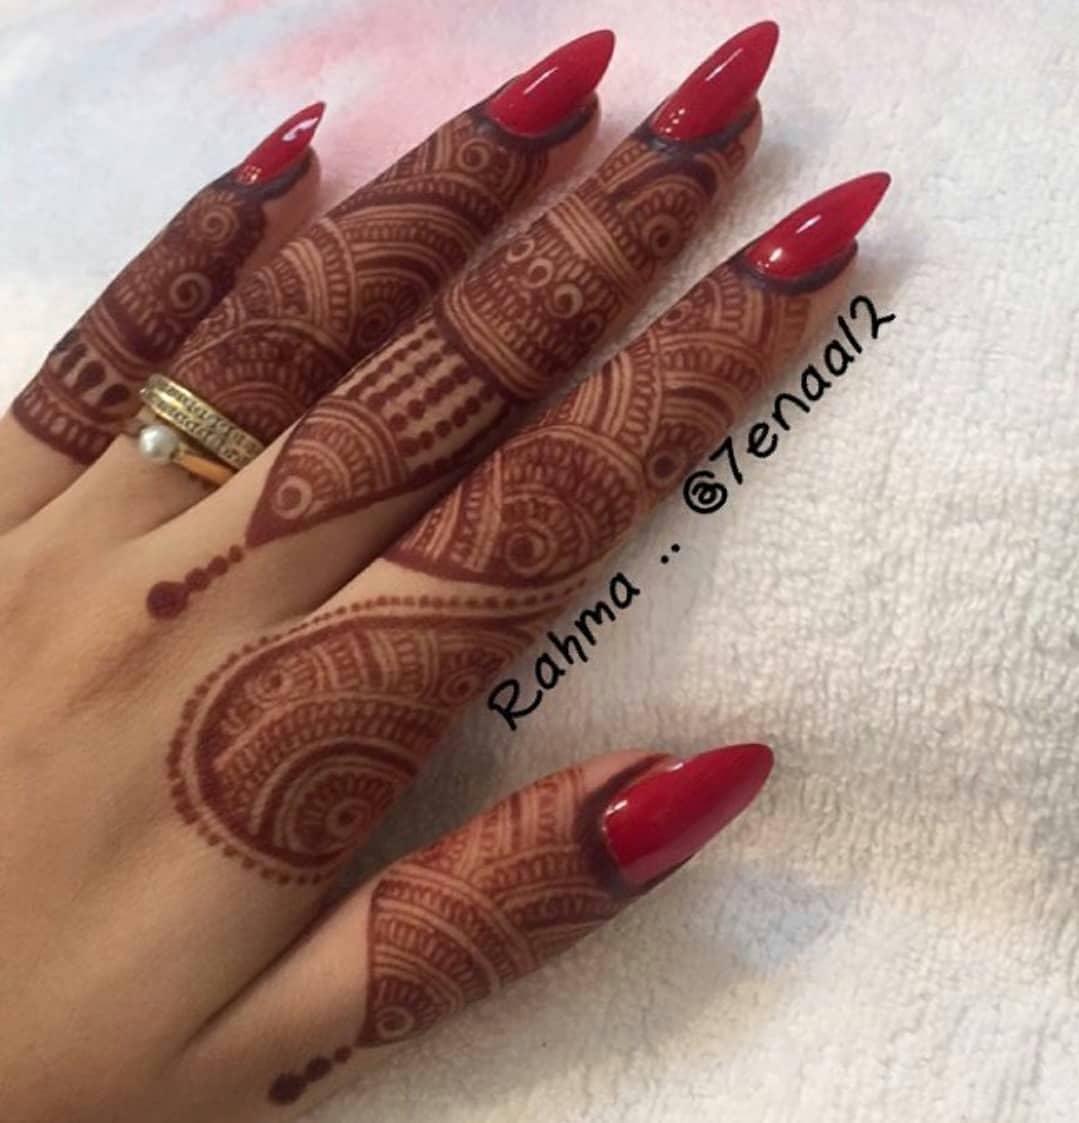 Adorable New Rakshabandhan Mehndi Designs For 2018 | Simple & Easy Rakshabandhan Mehndi Design To Try This Year | Simple Mehndi Designs For Beginners | Latest Rakhi Mehandi Designs | fingers Mehndi Designs